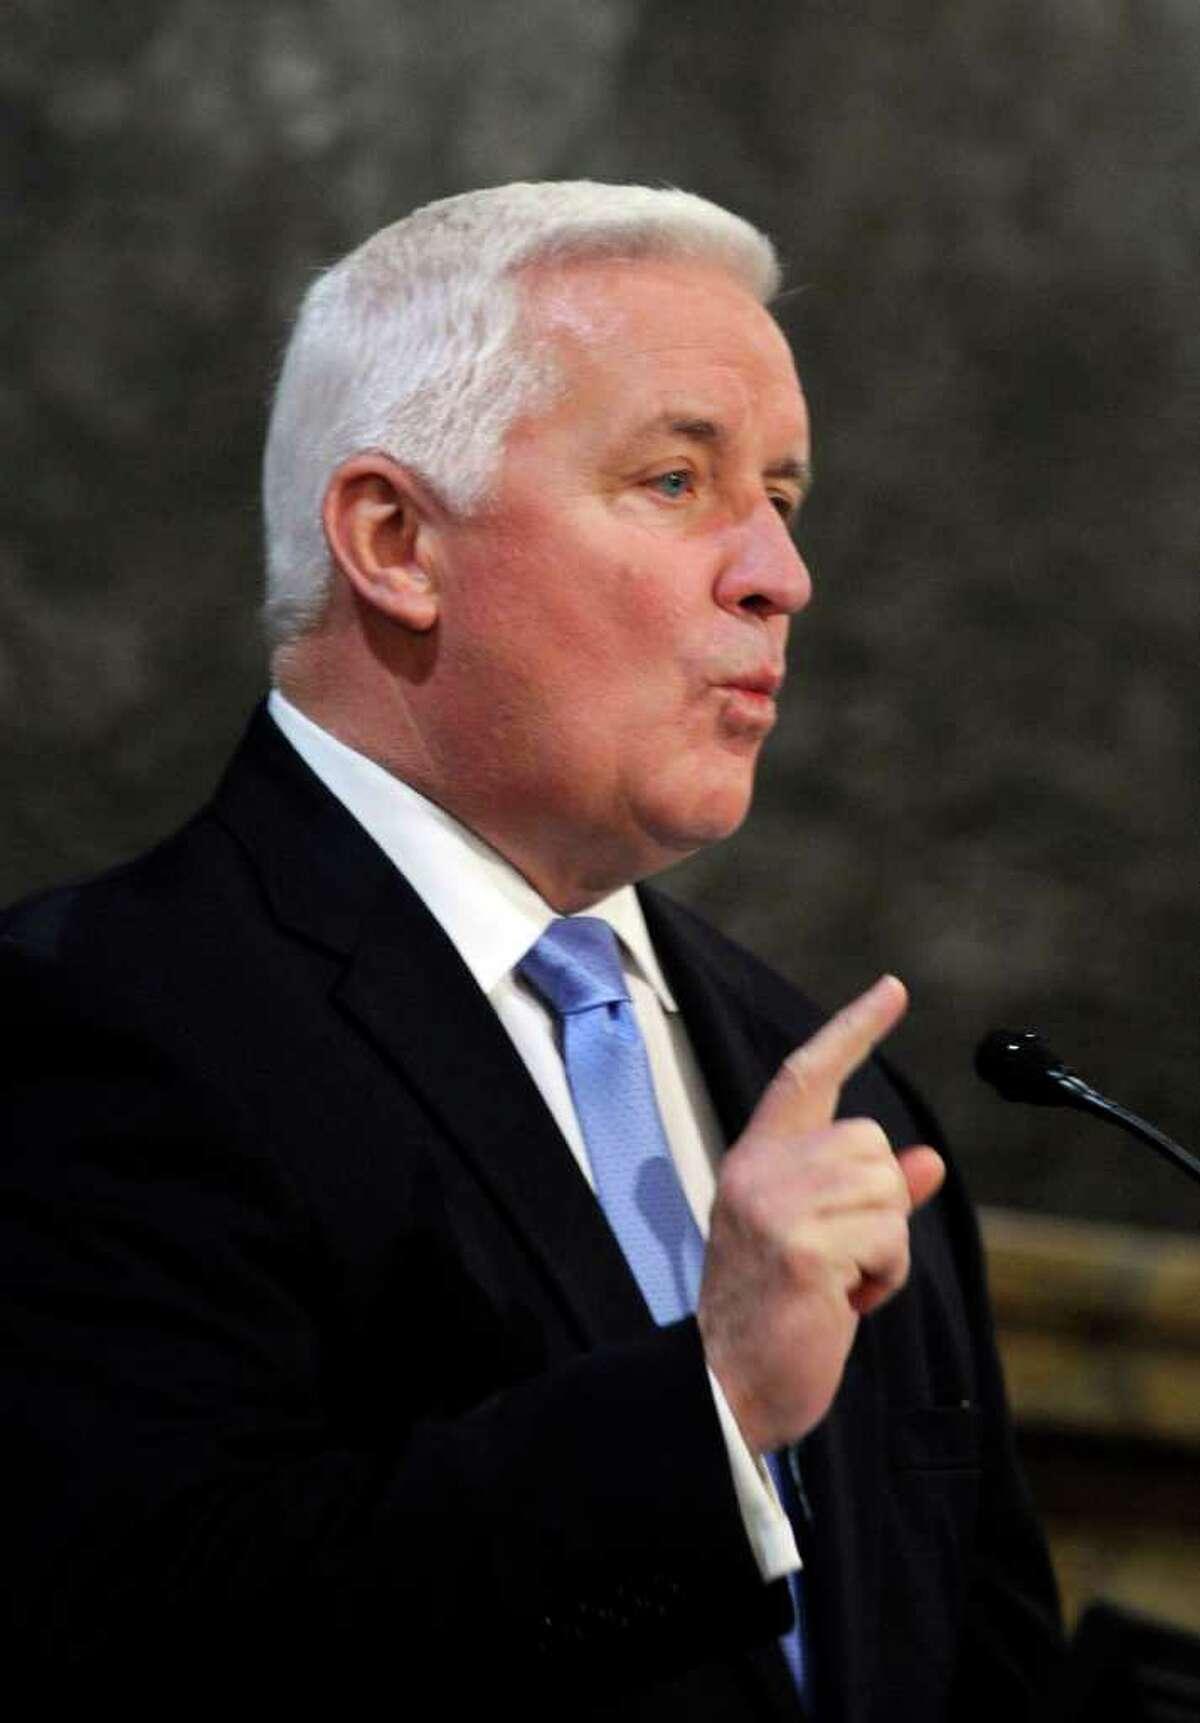 Pennsylvania Gov. Tom Corbett unveils his 2012-13 state budget proposal before the Pennsylvania House Chamber Tuesday, Feb. 7 2012 in Harrisburg, PA.(AP/Bradley C Bower)